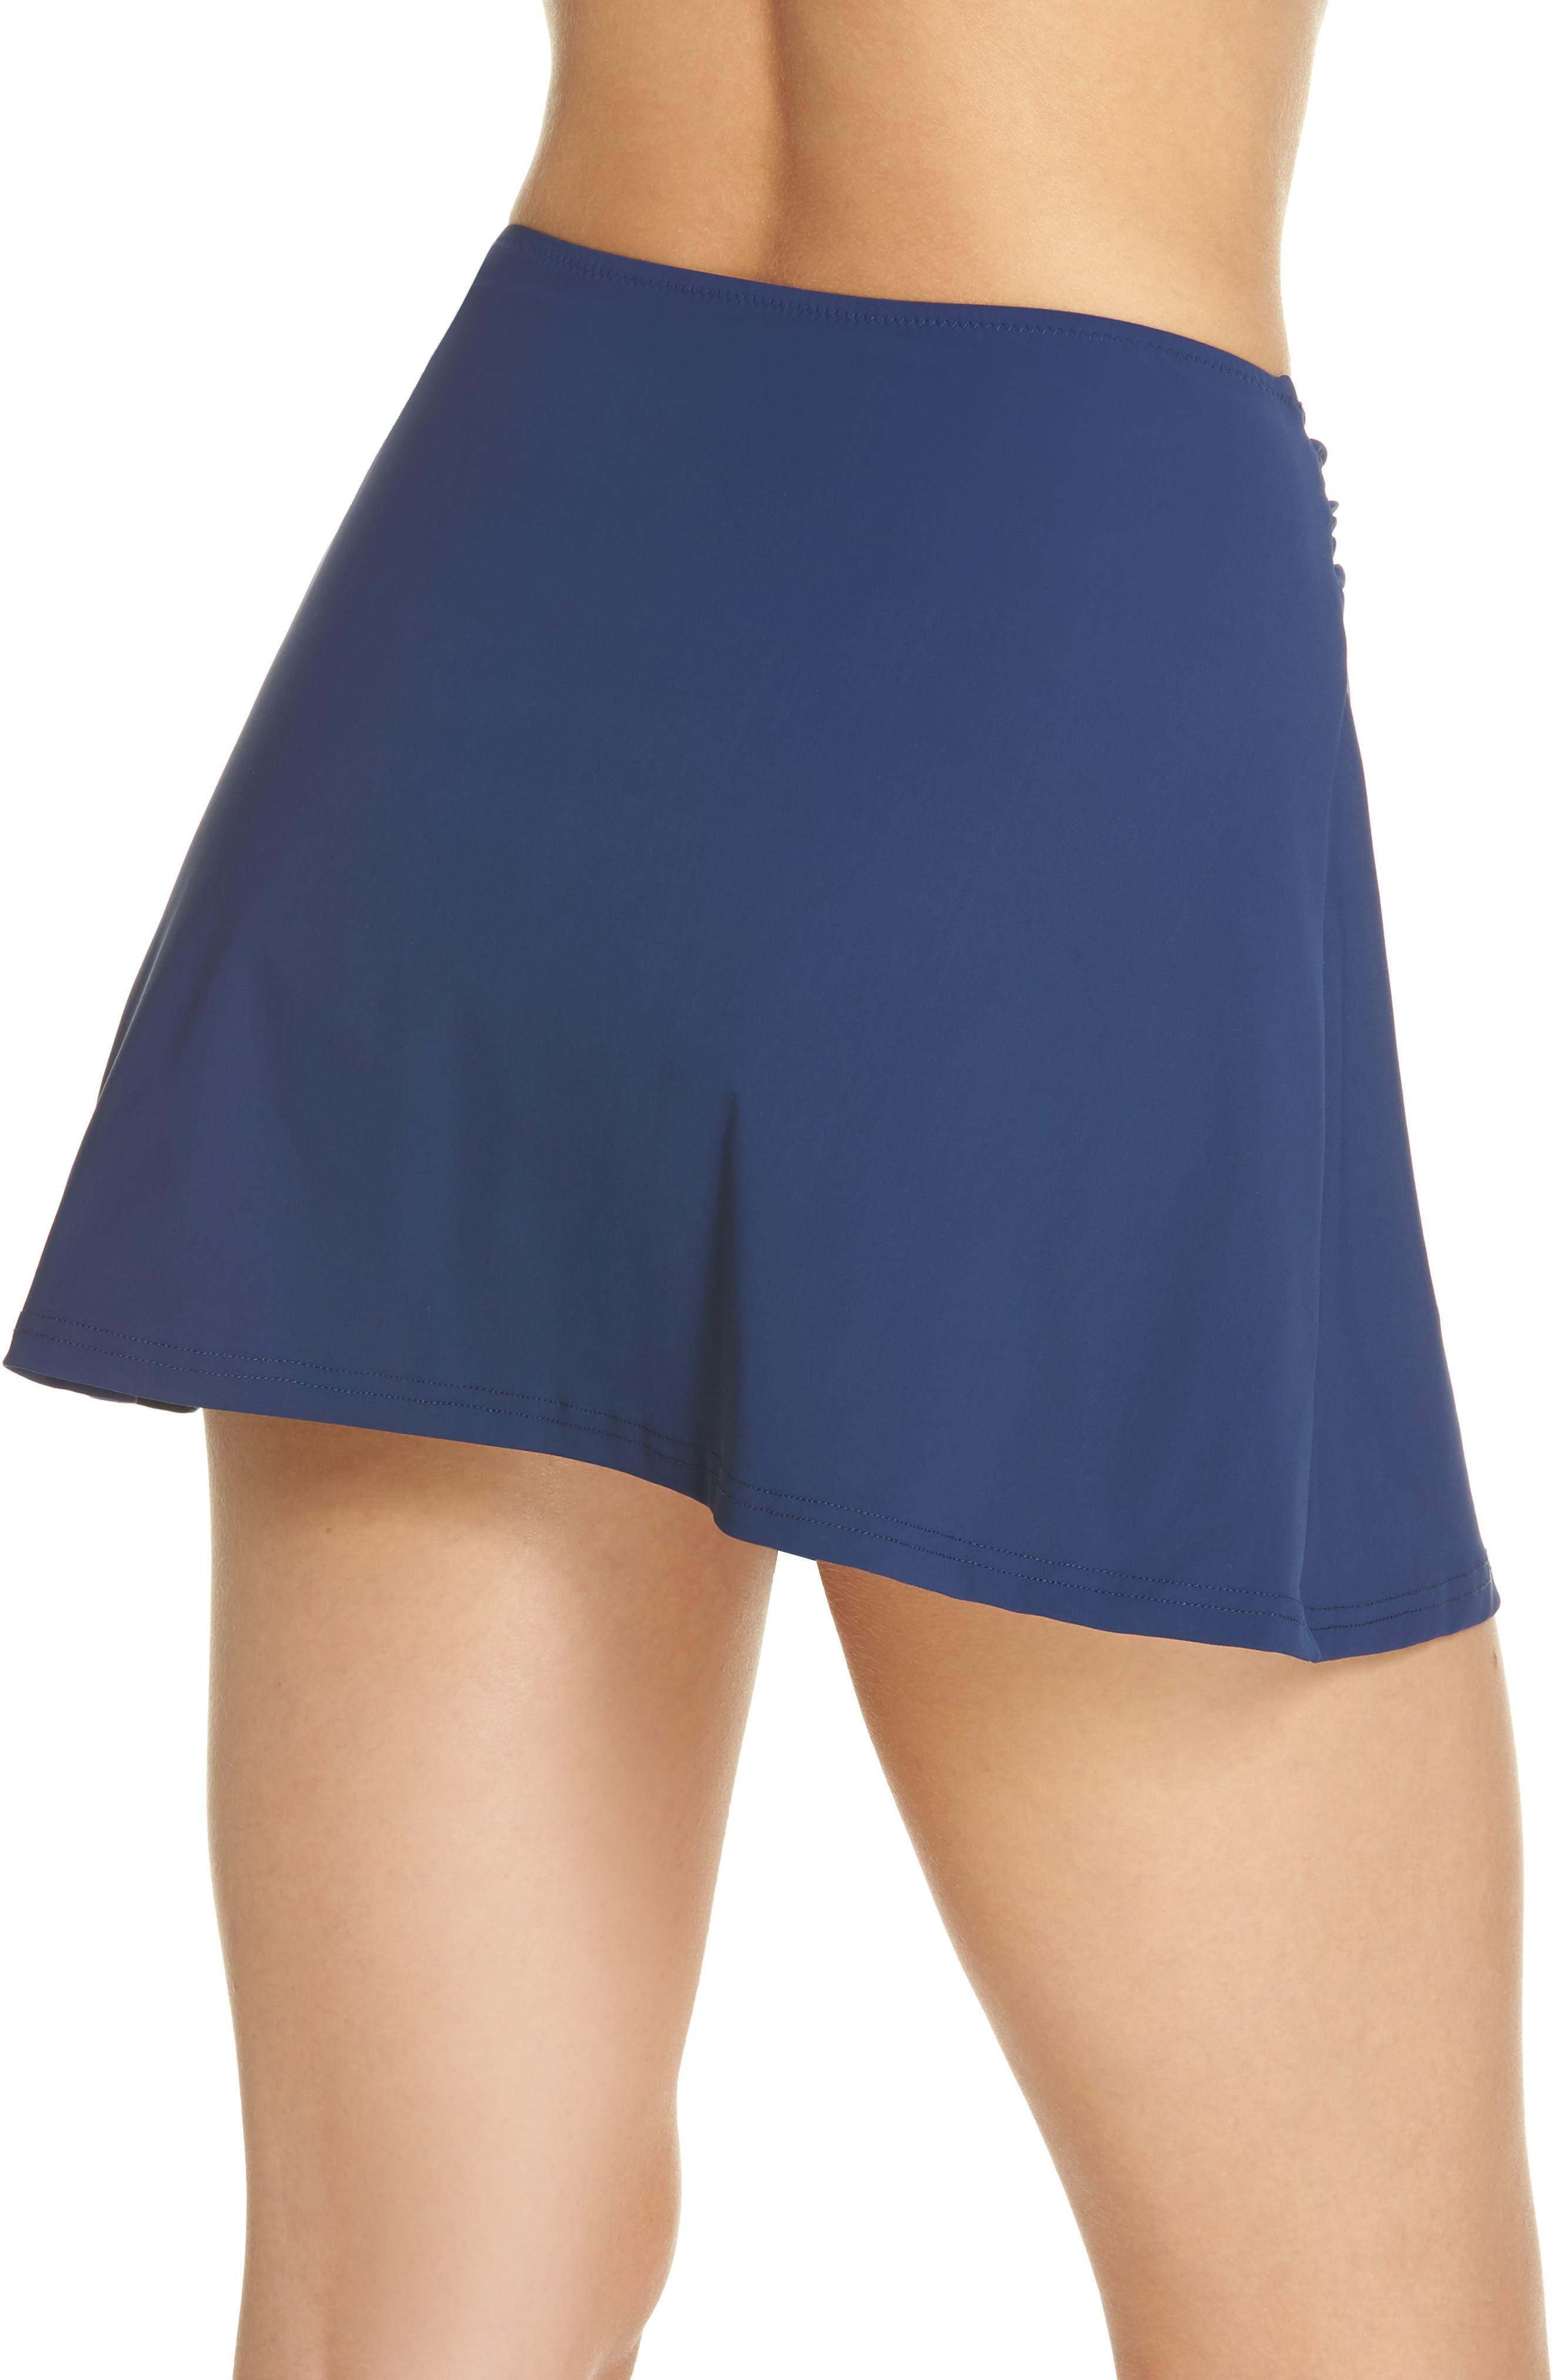 Beaded Cover-Up Skirt,                             Alternate thumbnail 2, color,                             PETROL